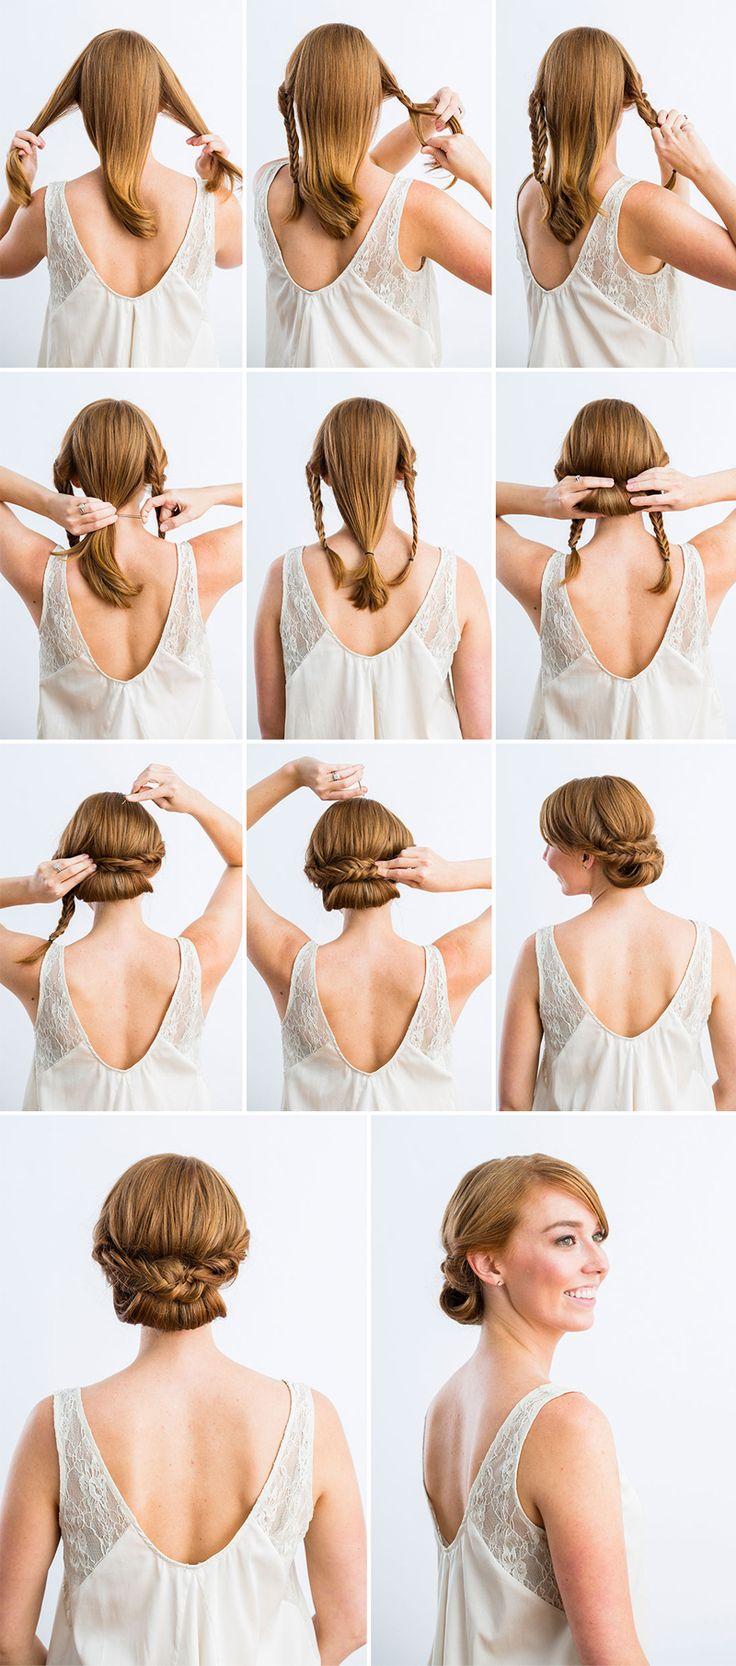 Yukata Hairstyles | Japan in 2019 | Hair styles, Diy ...